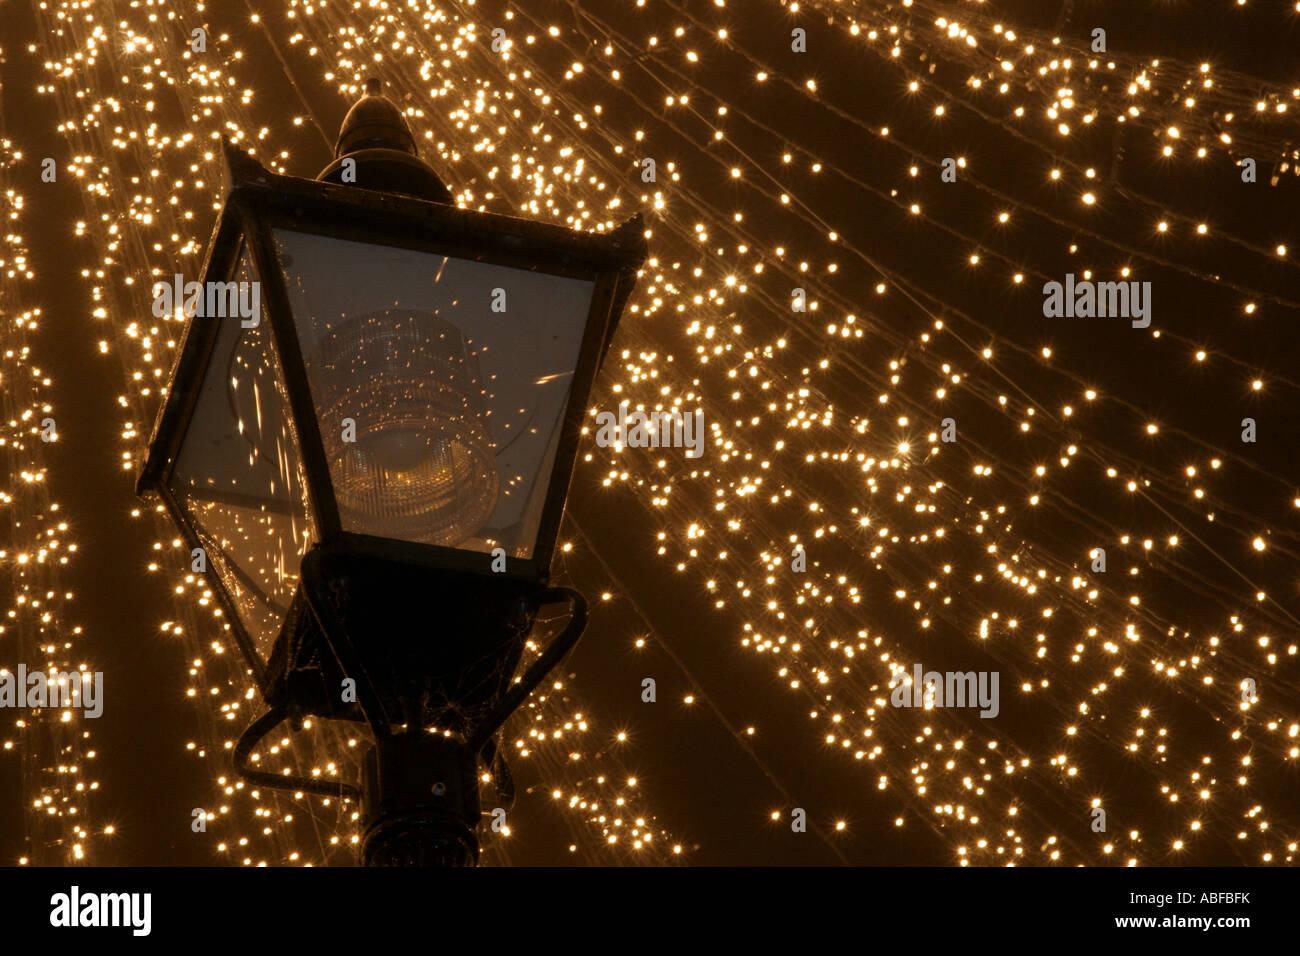 christmas street lighting in the uk stock image